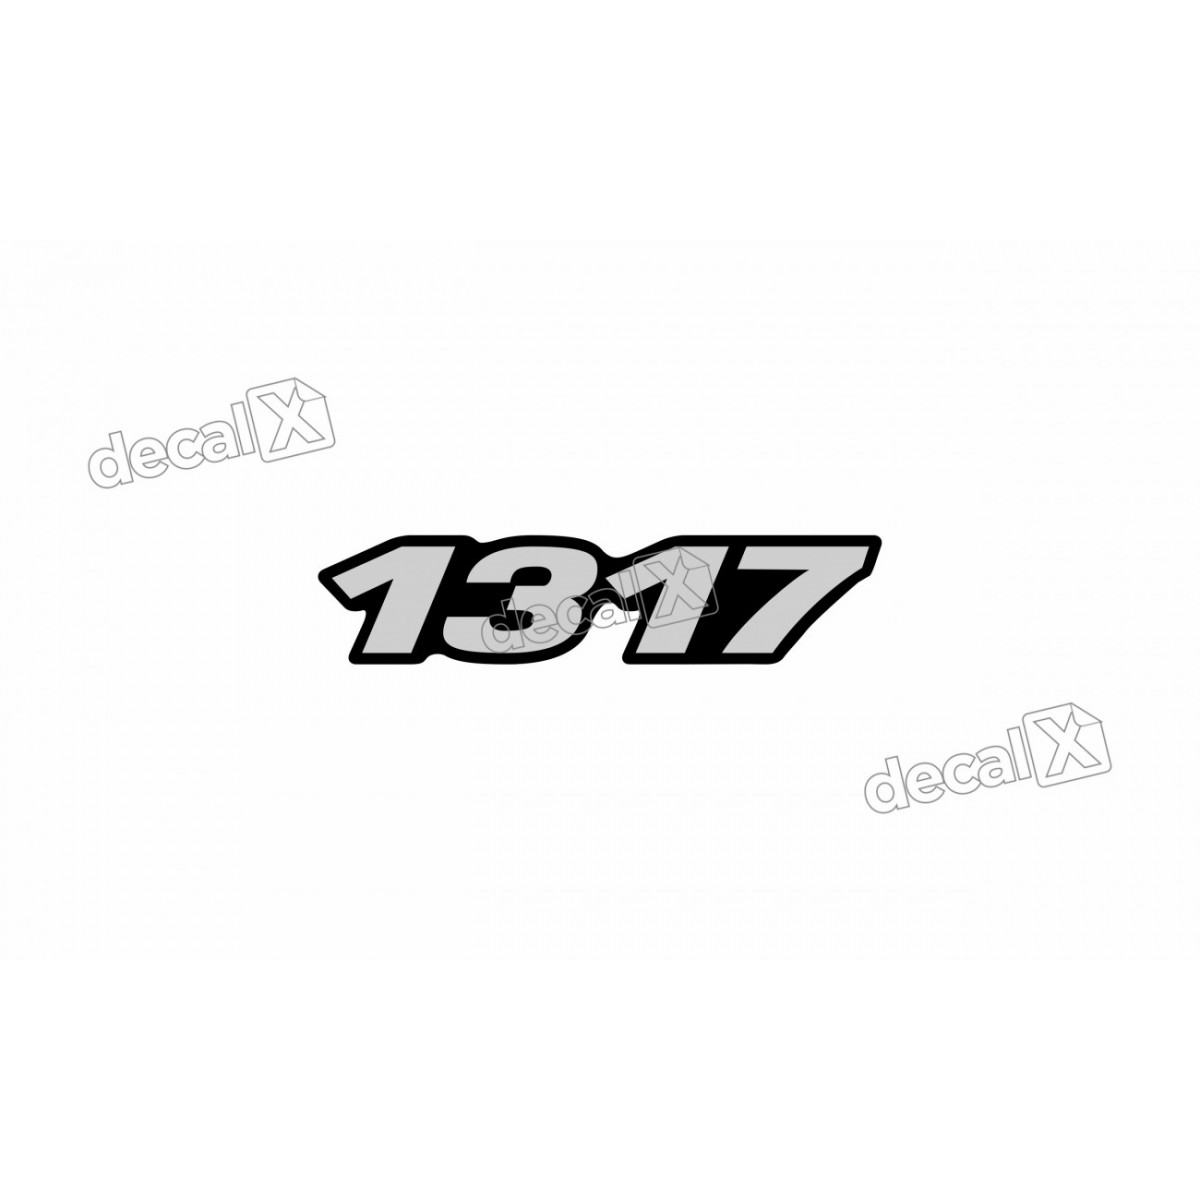 Adesivo Emblema Resinado Mercedes 1317 Cm26 Decalx